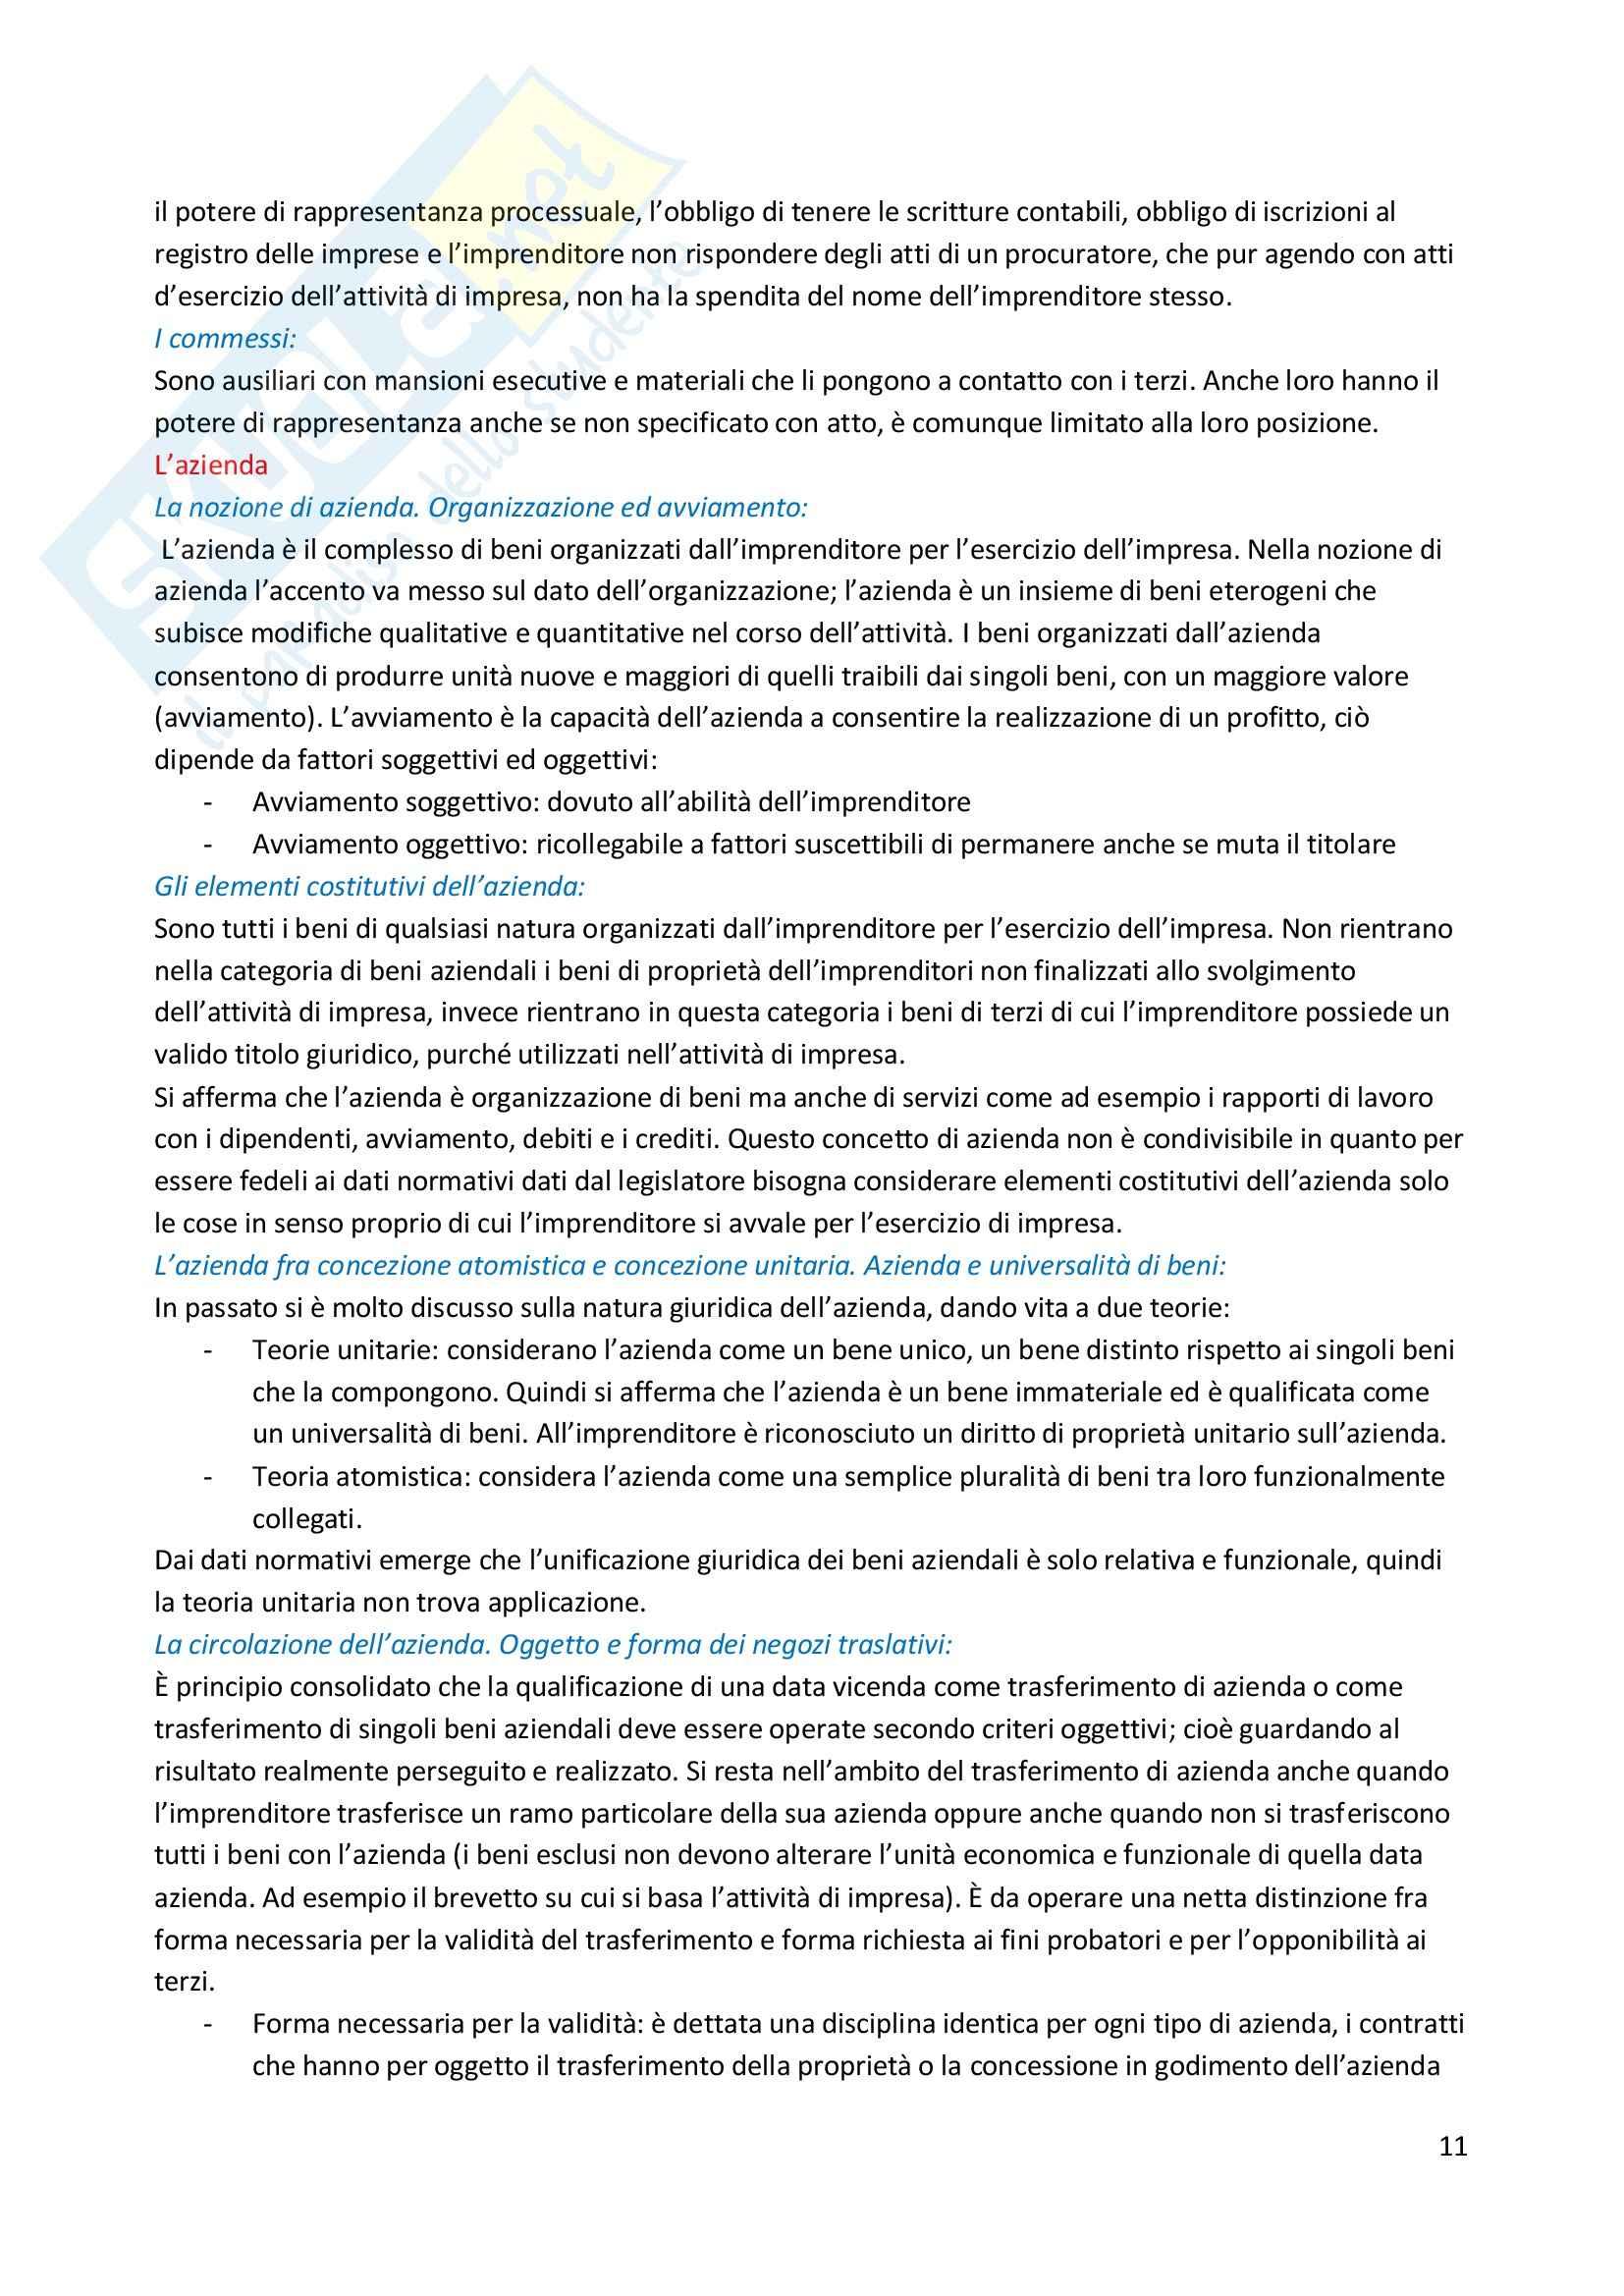 Riassunto esame Diritto Commerciale, prof. Bocchiola Pag. 11